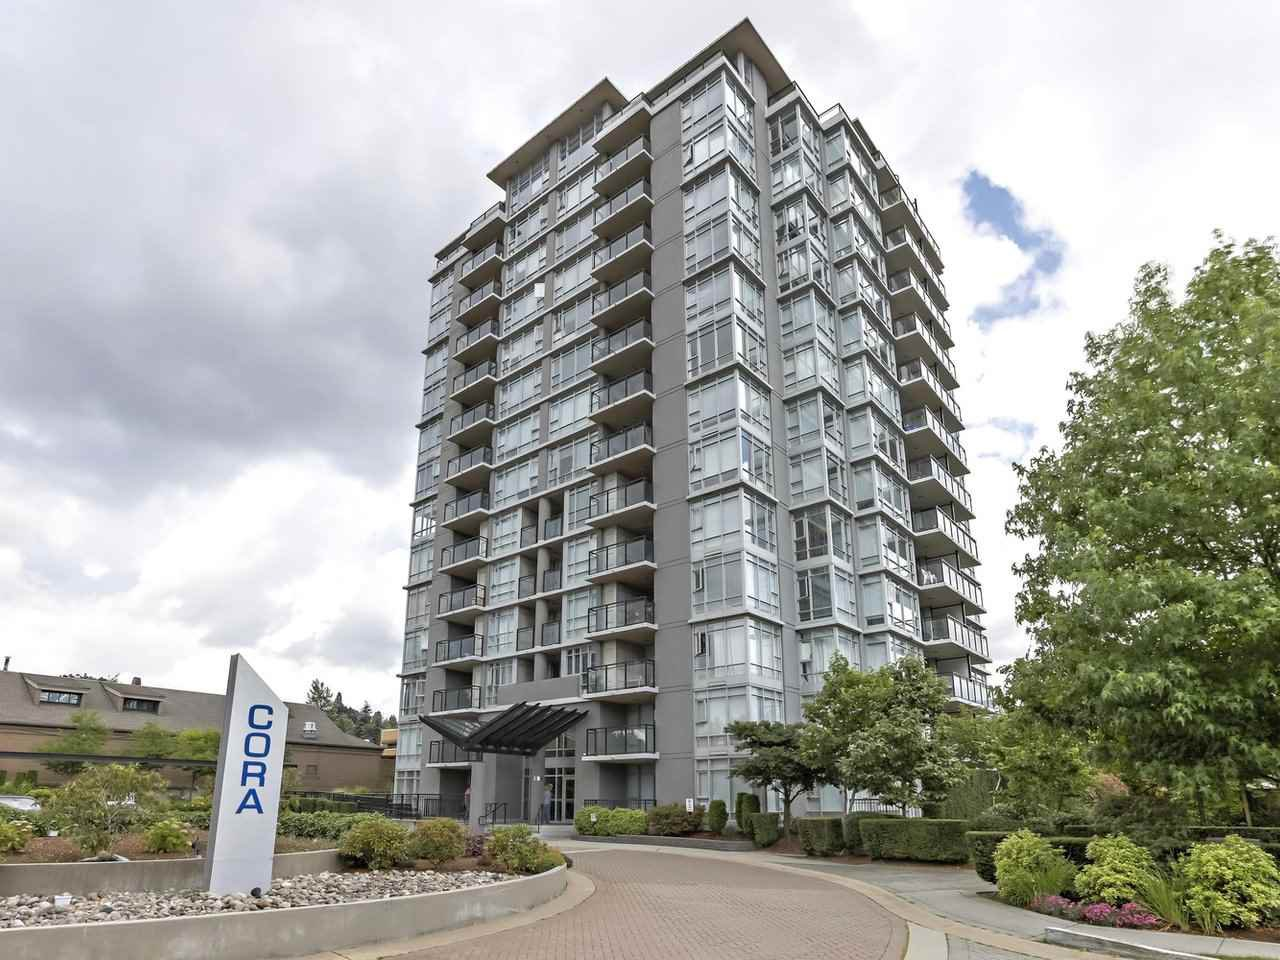 "Main Photo: 203 575 DELESTRE Avenue in Coquitlam: Coquitlam West Condo for sale in ""CORA"" : MLS®# R2382731"